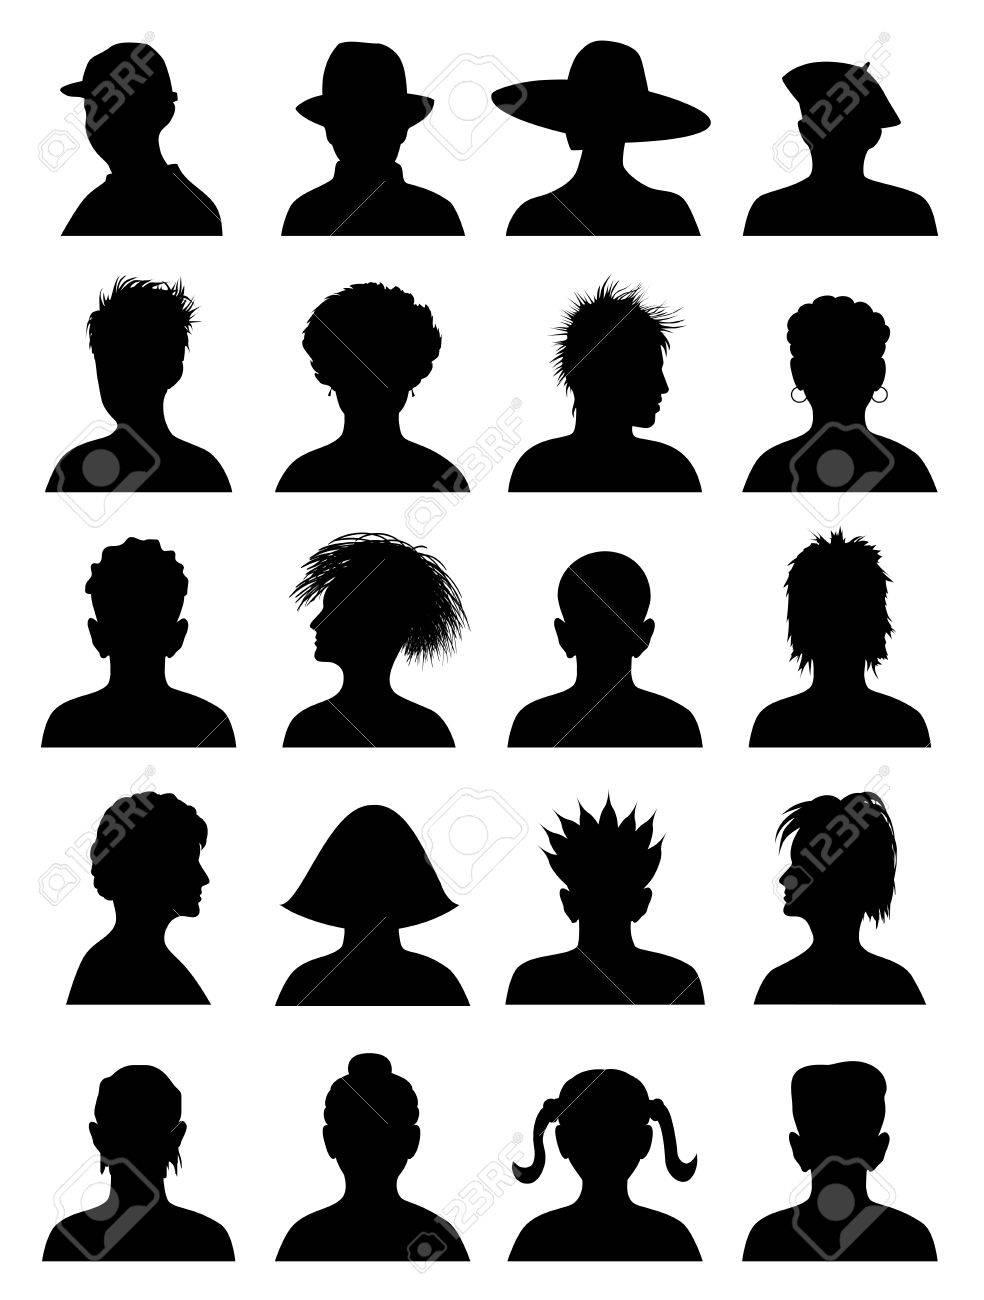 20 Anonymous Mugshots, abstract illustration